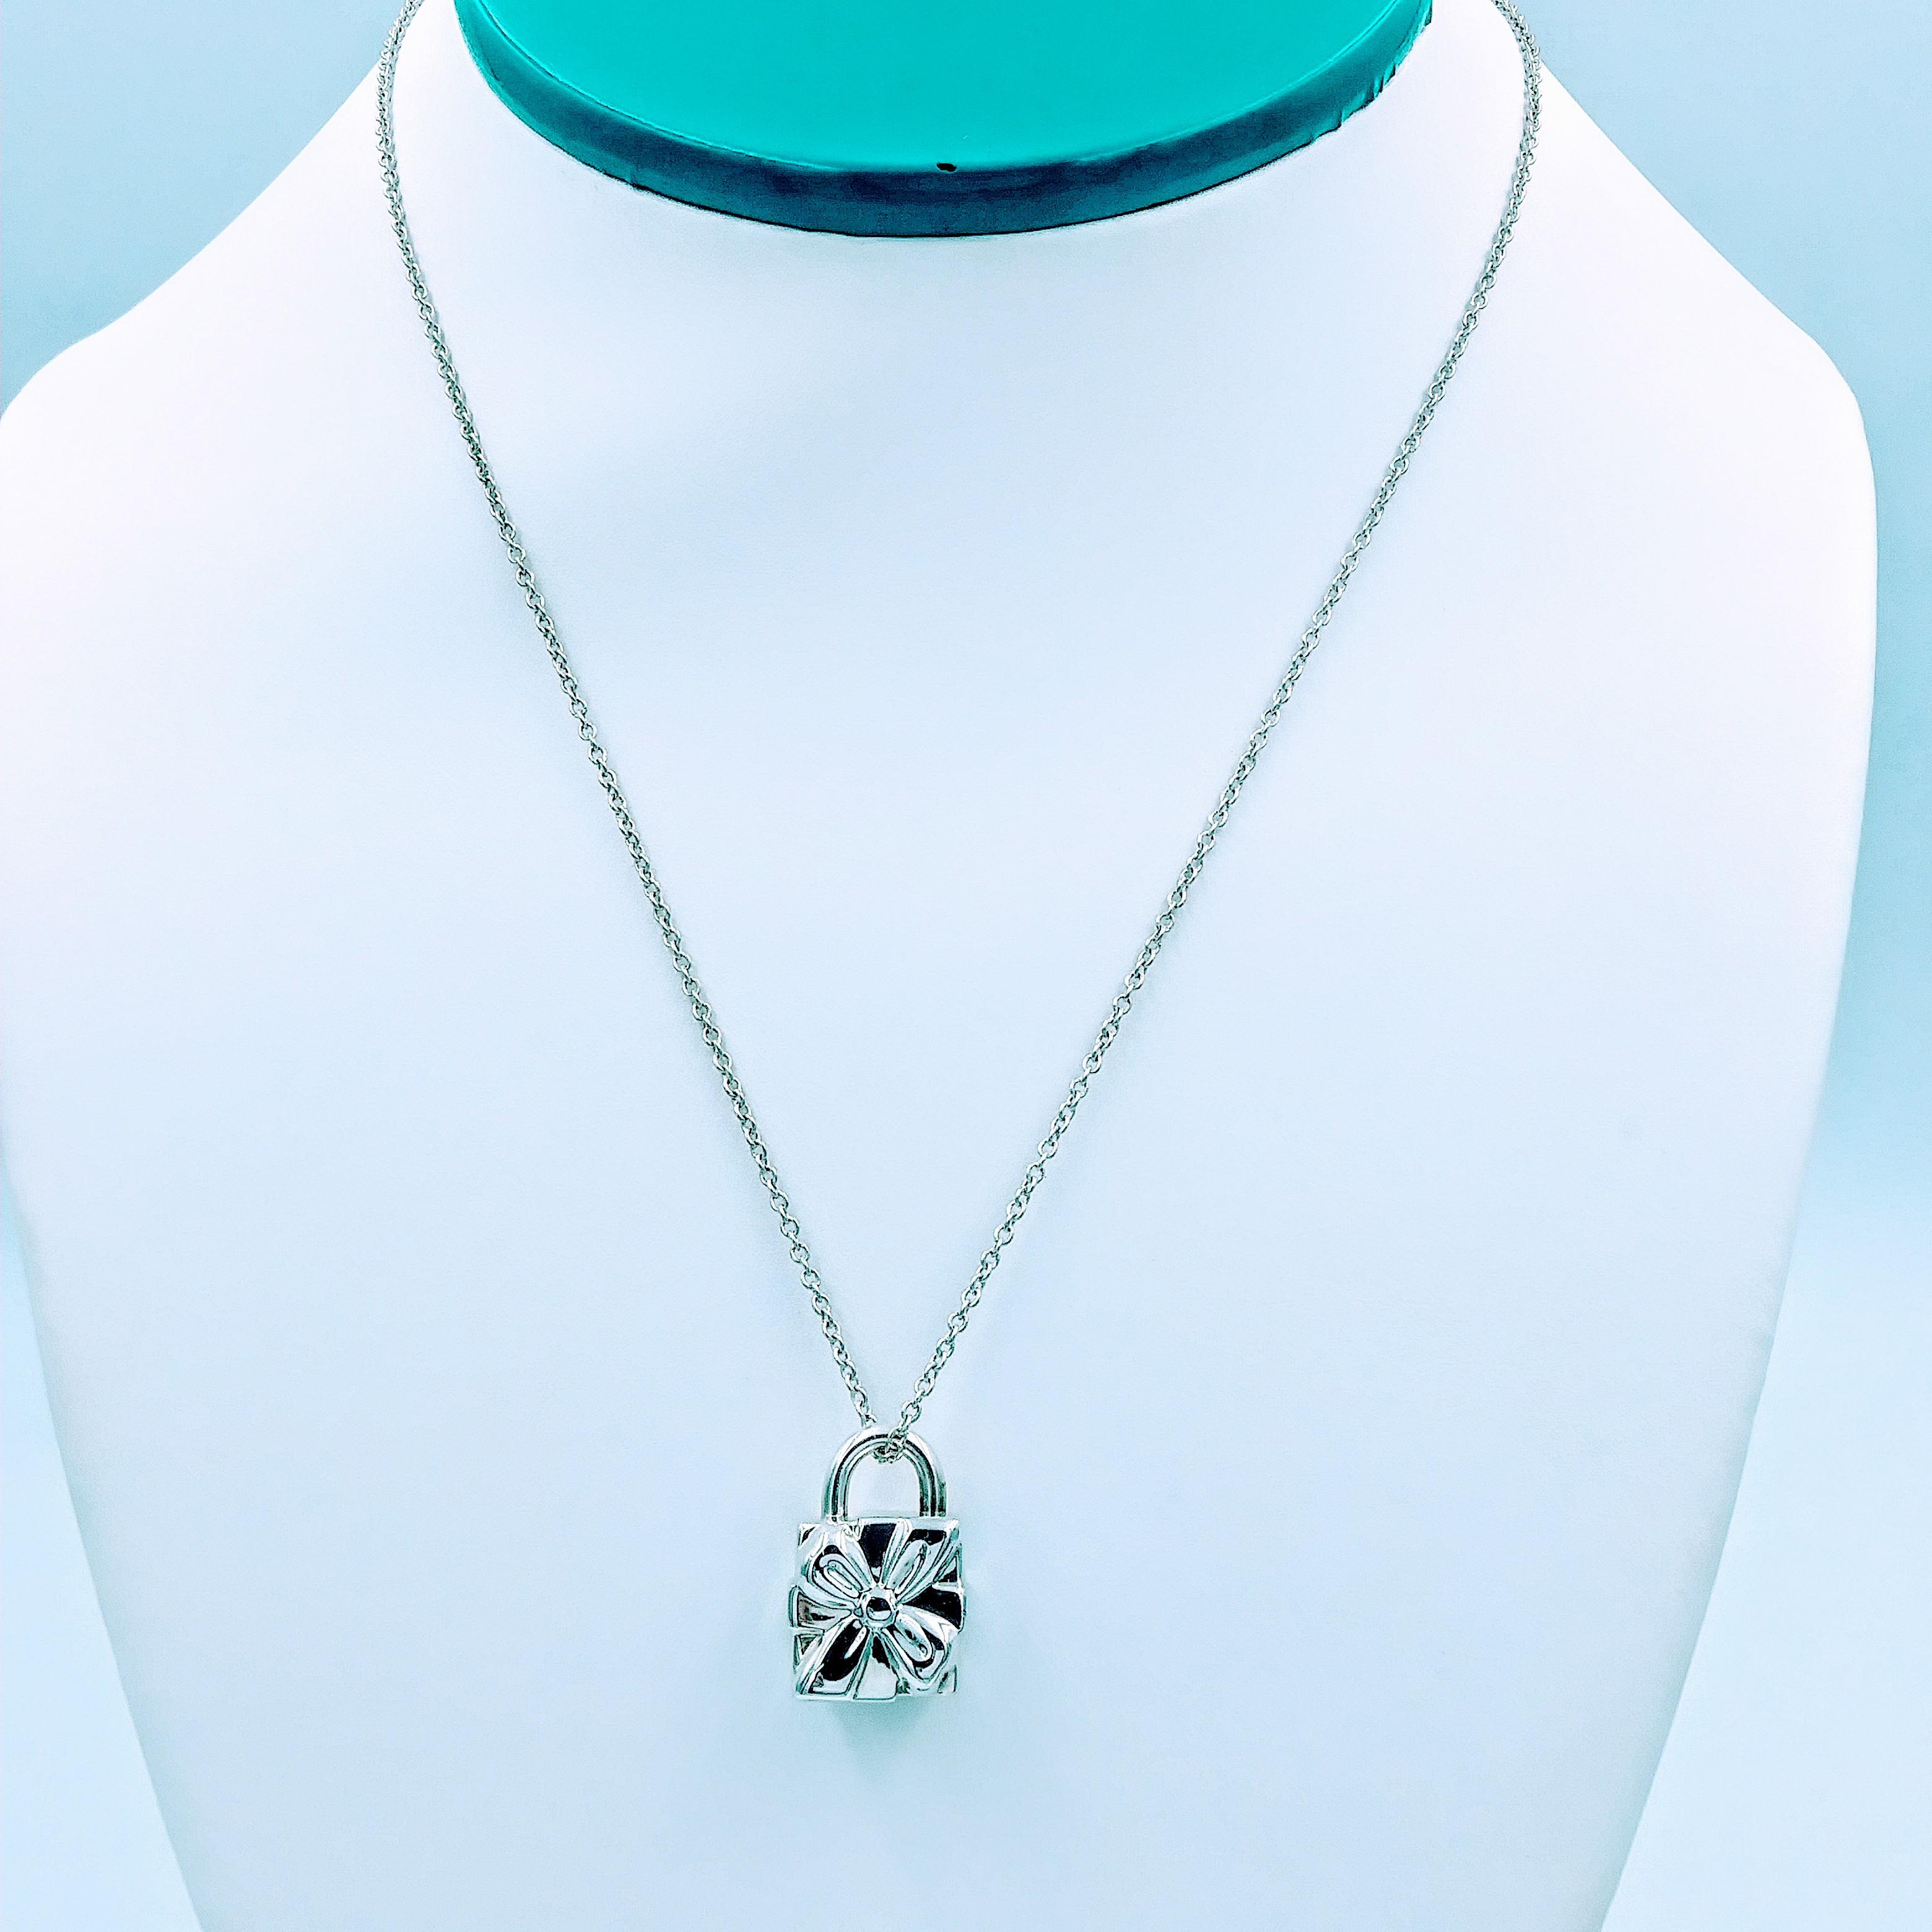 <b>Tiffany & Co.</b> Gift Box Charm Lock Pendant Necklace 16